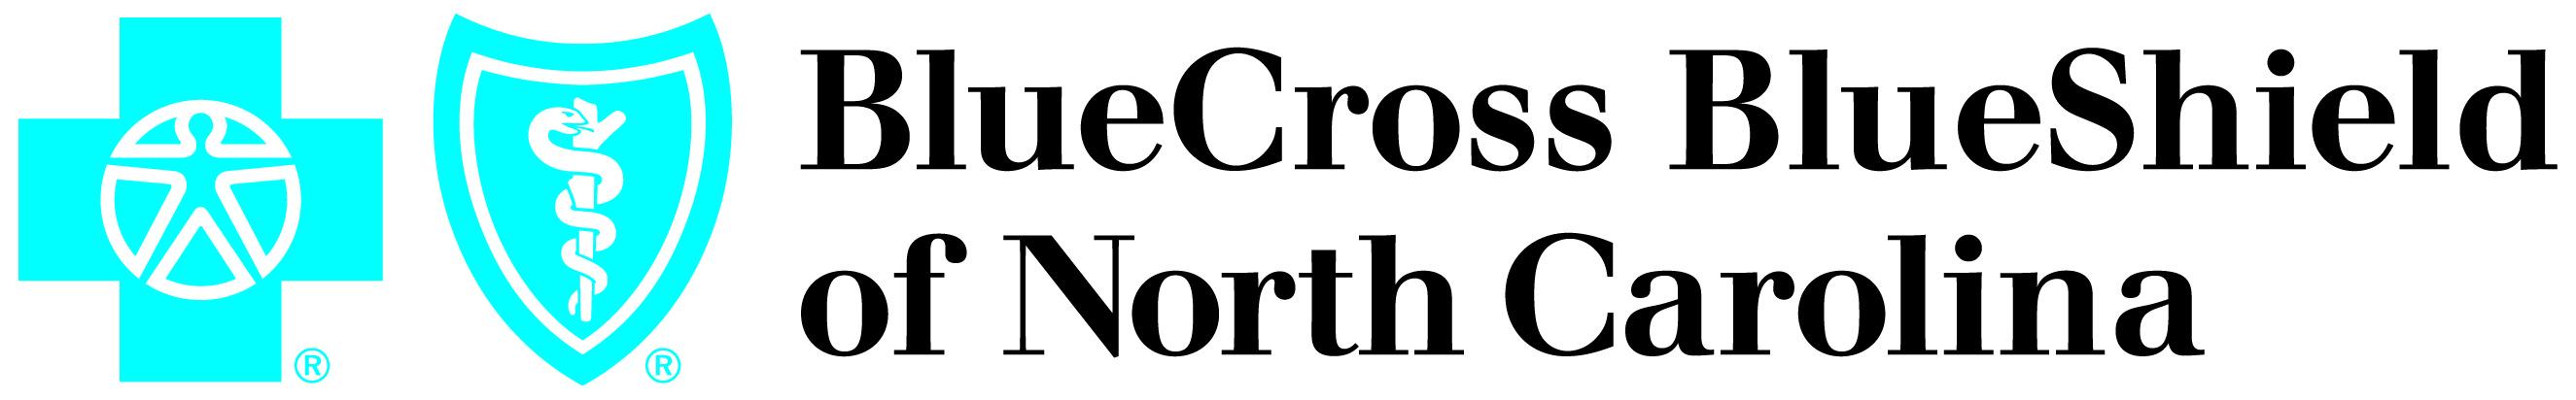 Western North Carolina Hospital Dispute- Logo